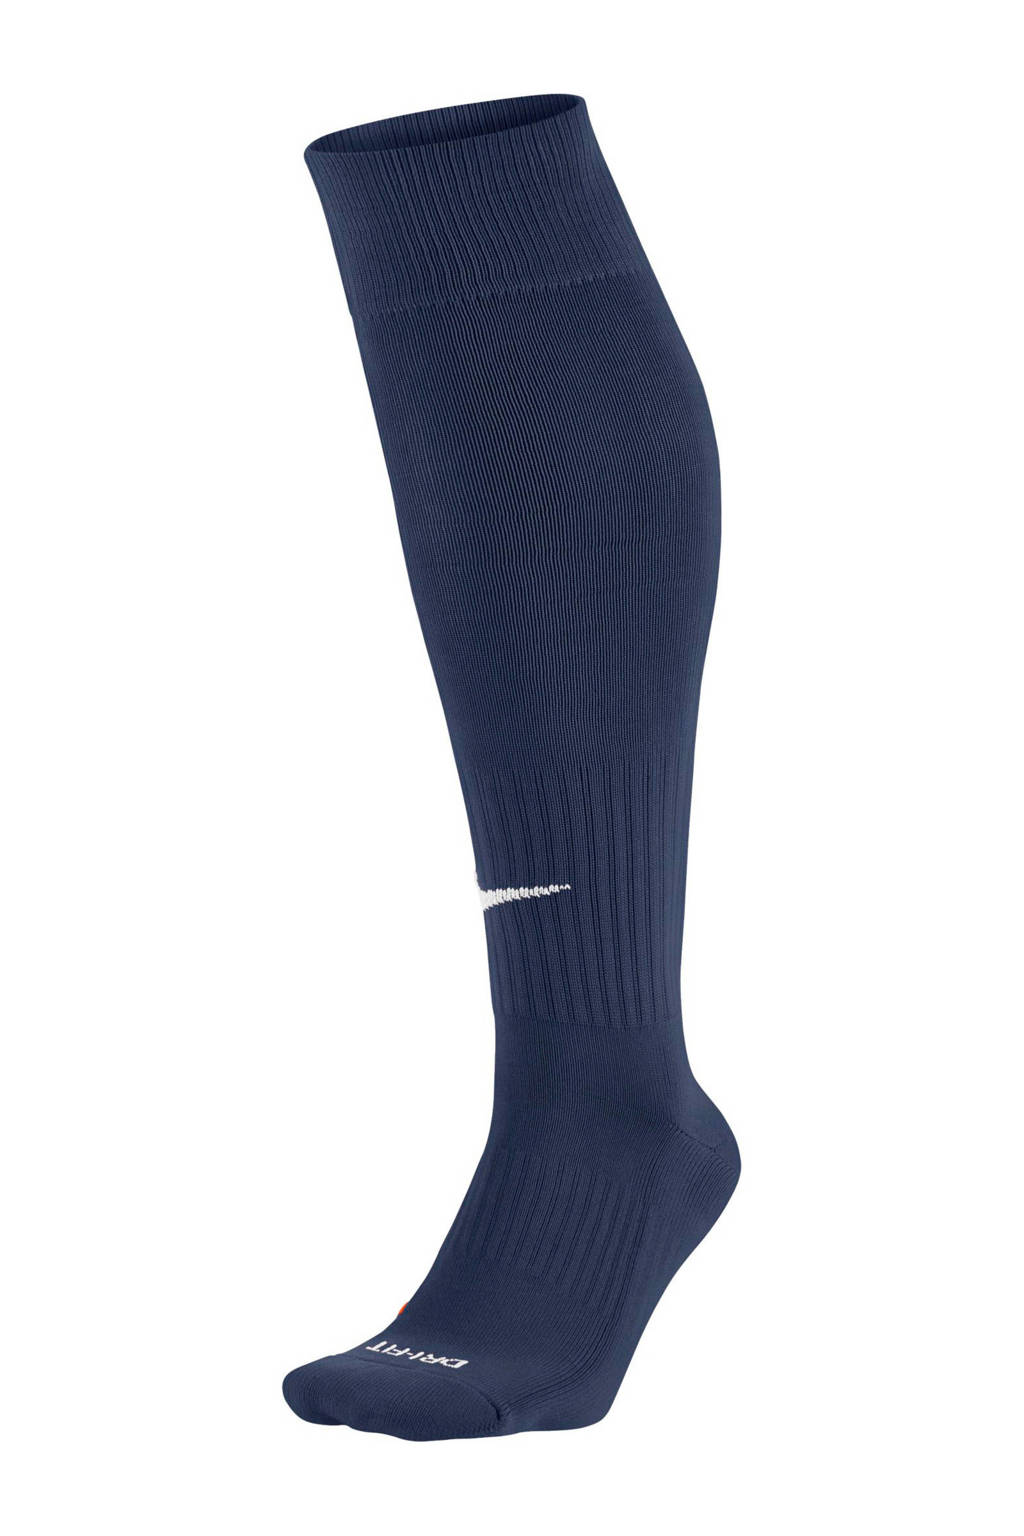 Nike   voetbalsokken donkerblauw, Donkerblauw